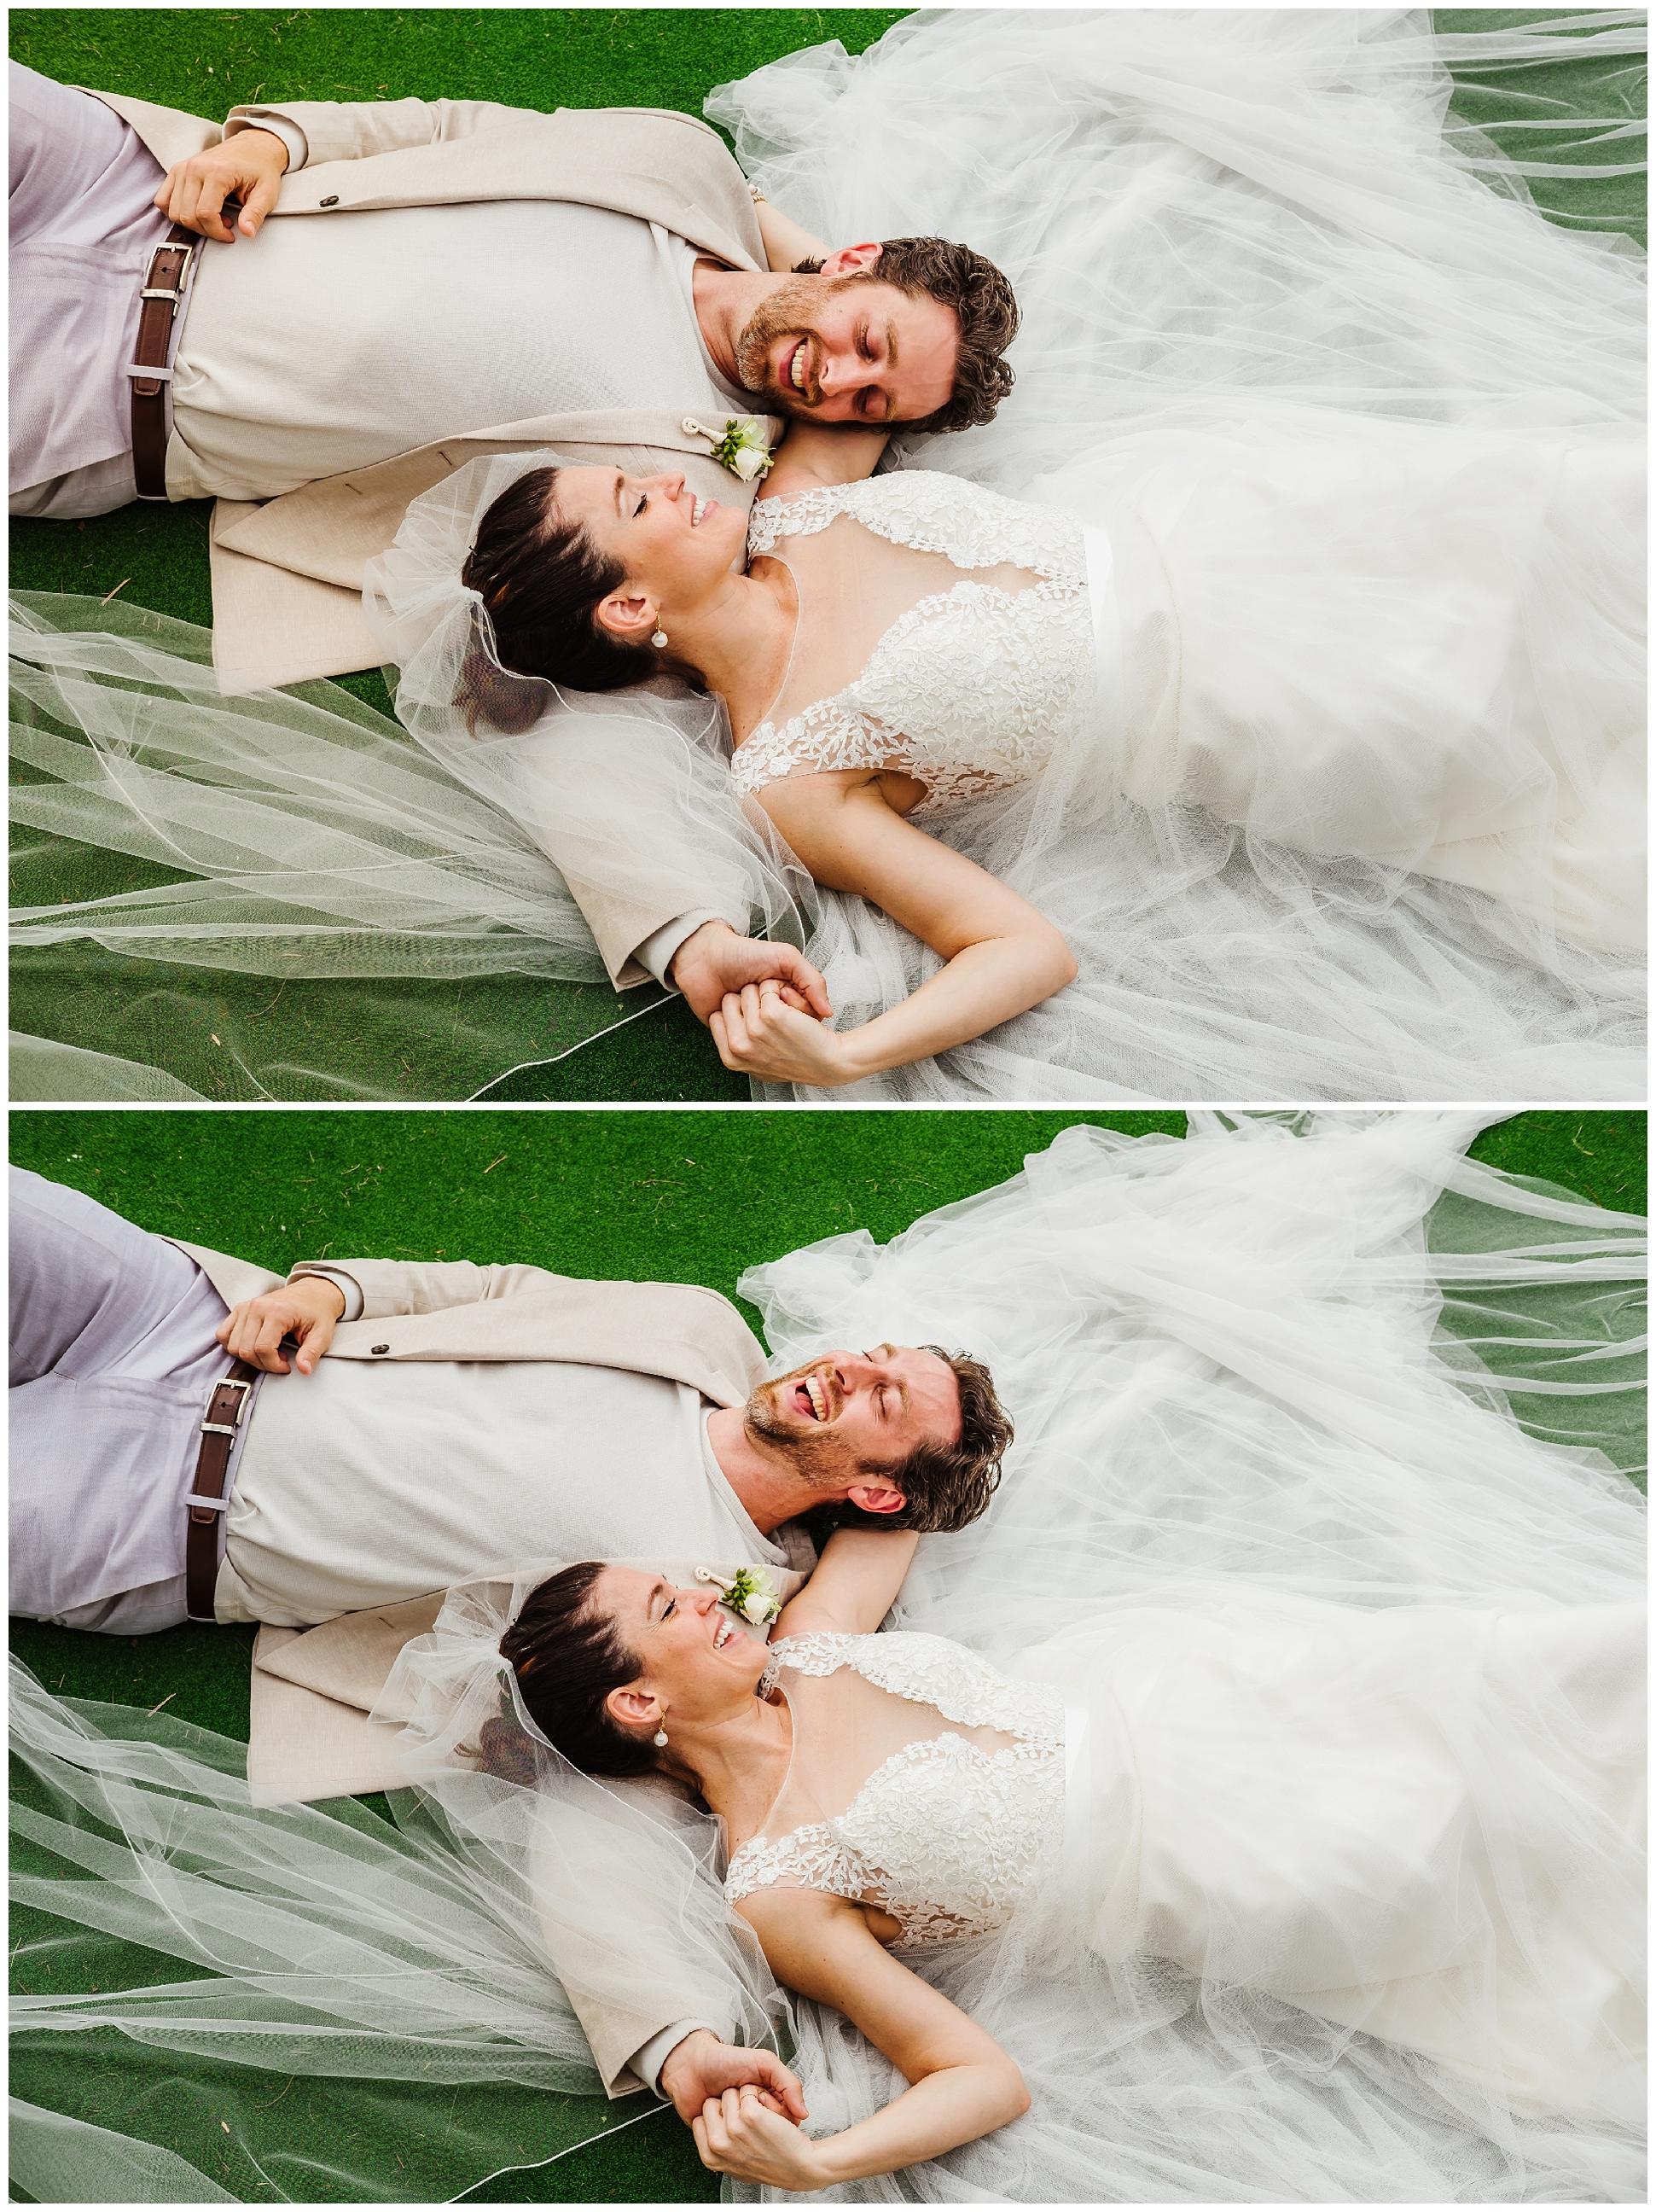 tampa-wedding-photographer-tradewinds-beach-family-elopement_0109.jpg